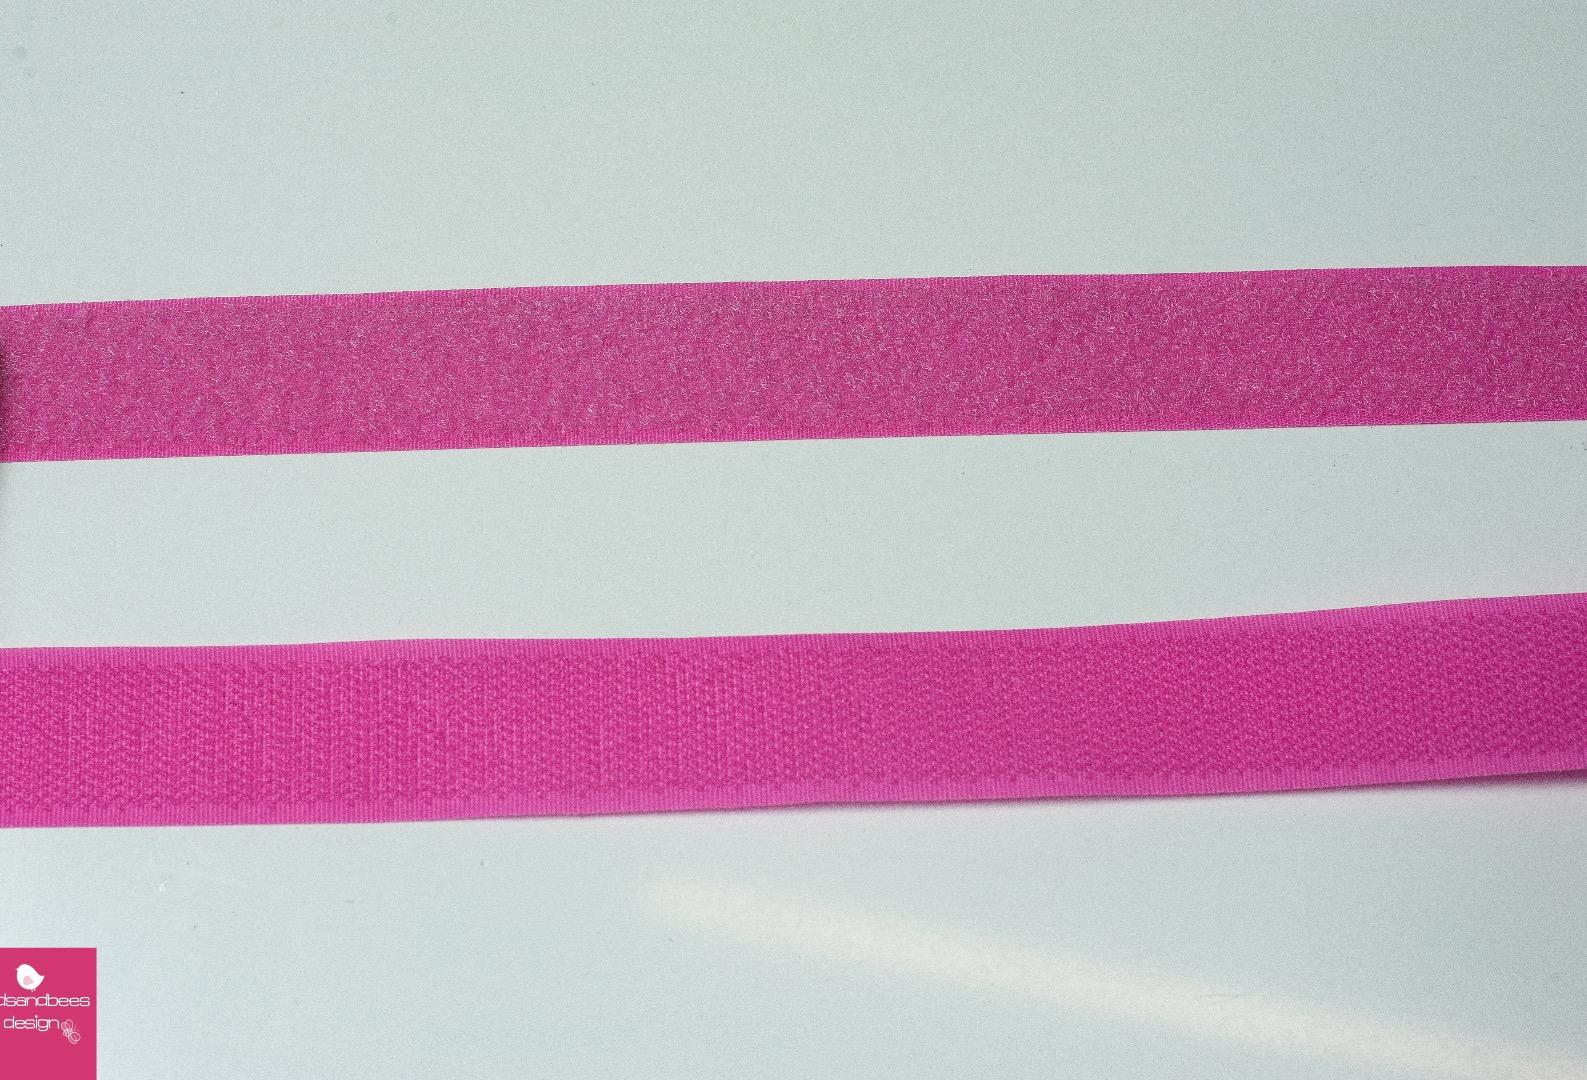 Klettband 1m 25mm - Pink